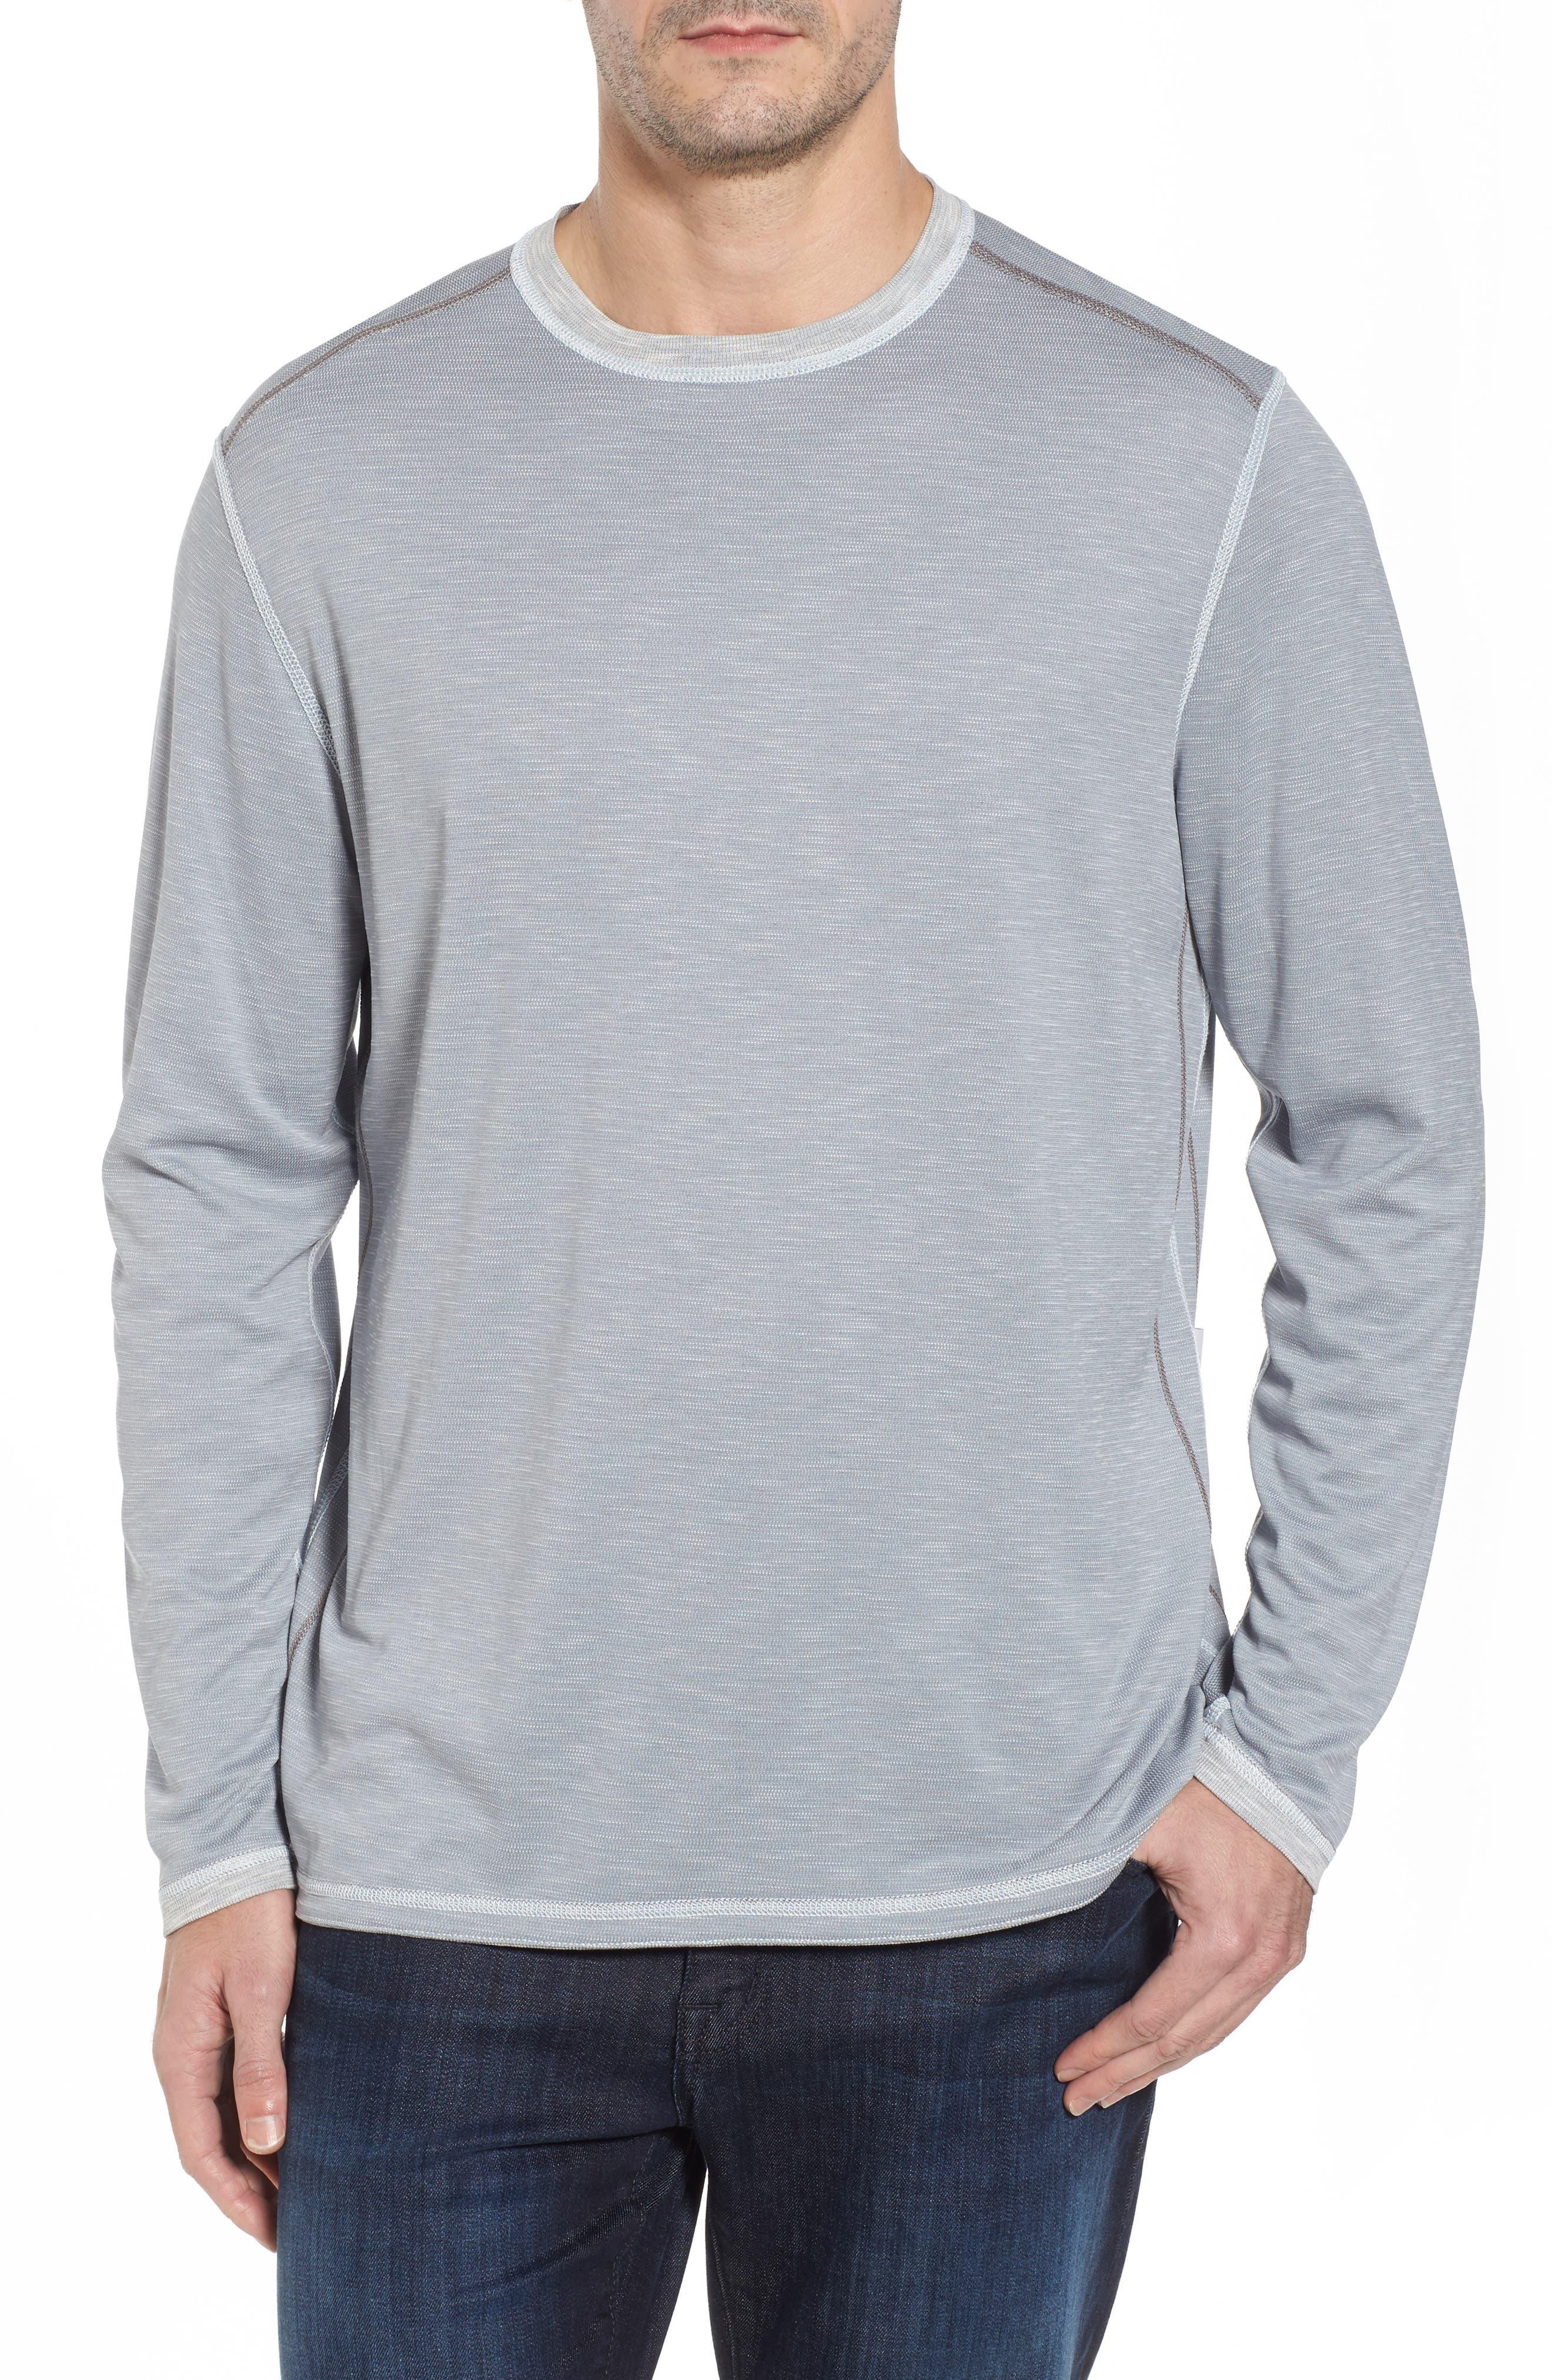 Alternate Image 2  - Tommy Bahama Flip Tide Long Sleeve T-Shirt